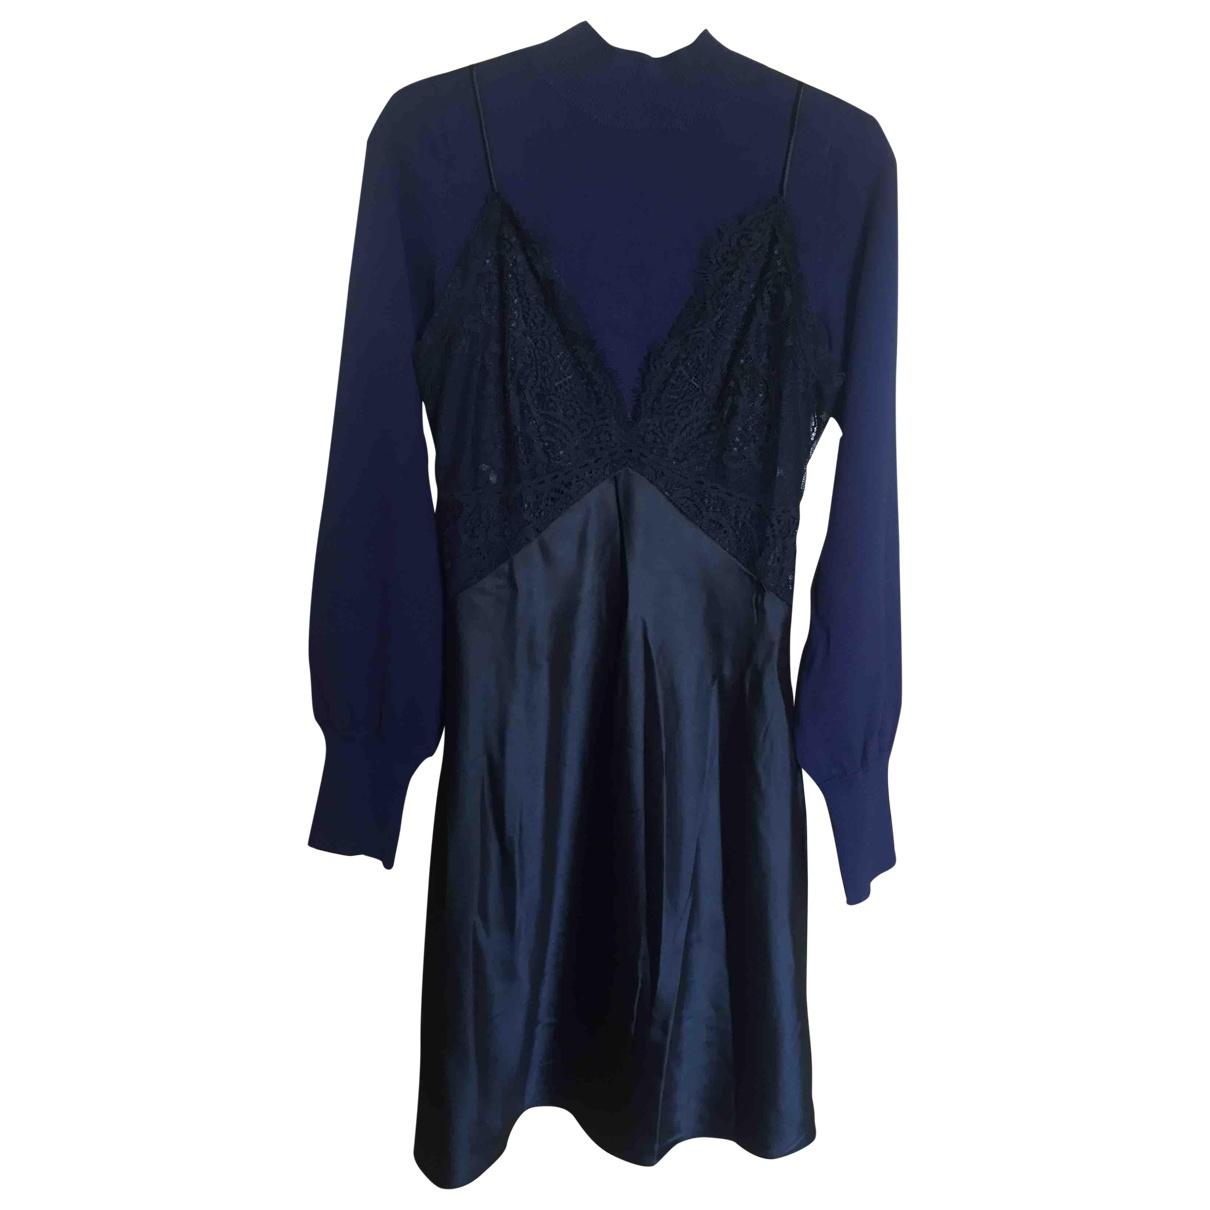 tophop \N Black dress for Women XS International